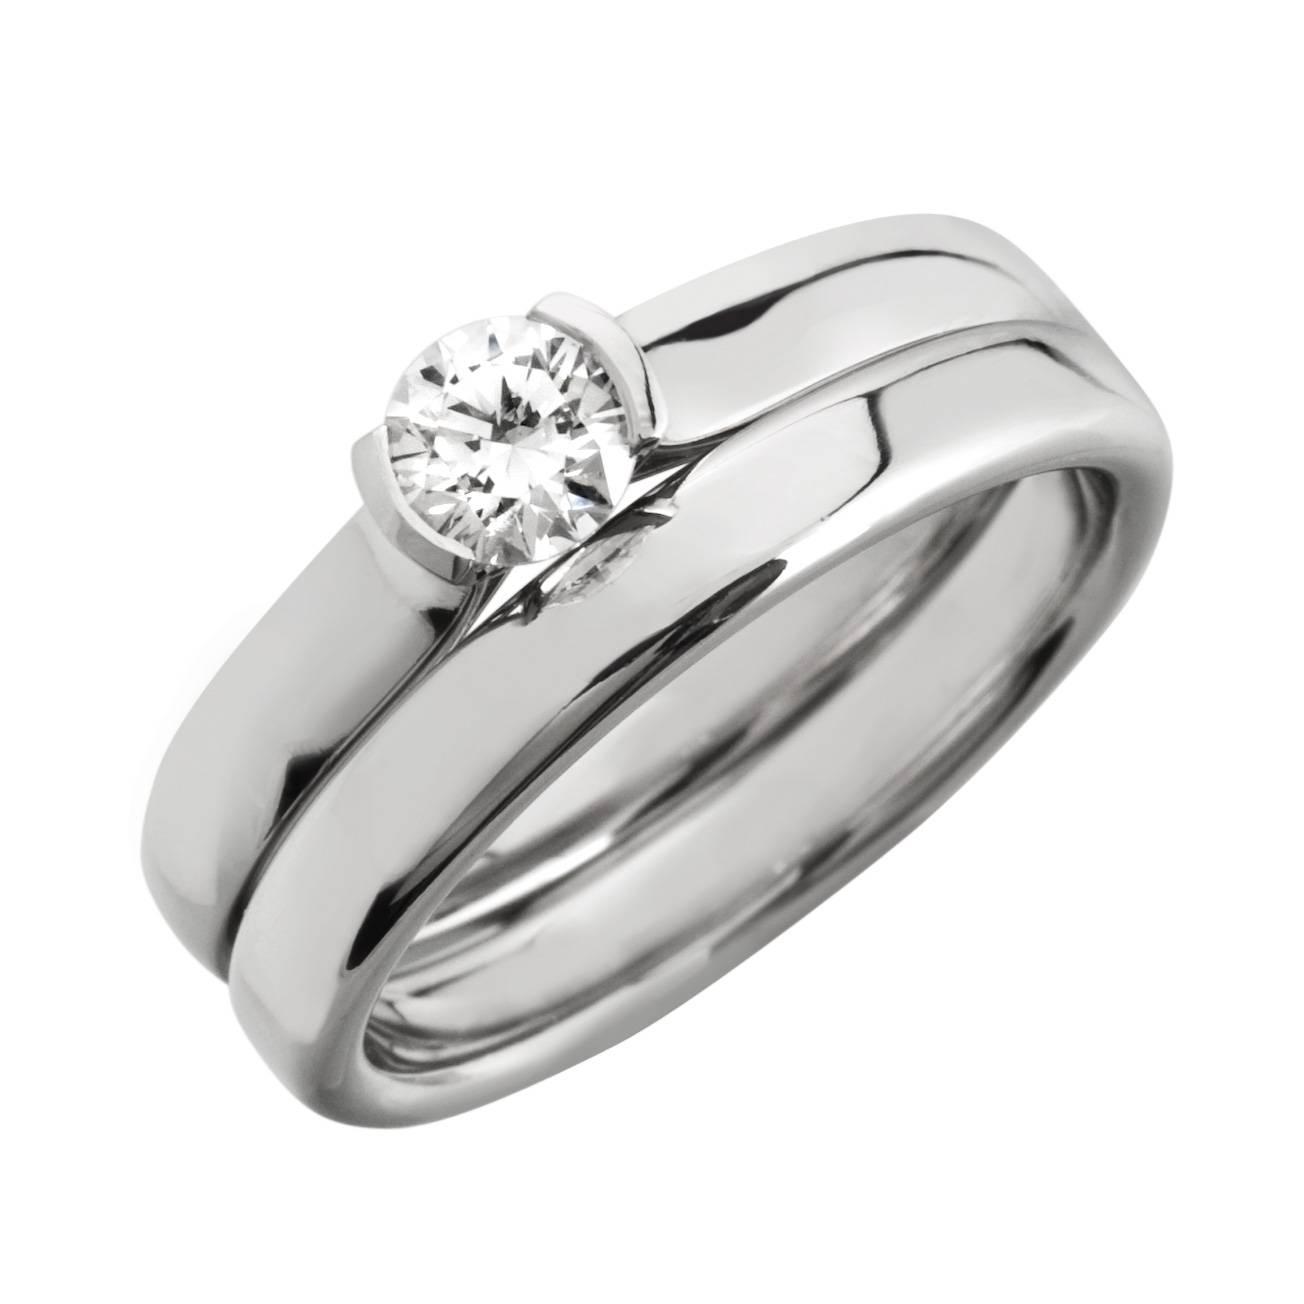 Wedding Rings : Engagement Rings Set Diamond Bridal Ring Sets For Wedding Engagement Ring Sets (View 2 of 15)